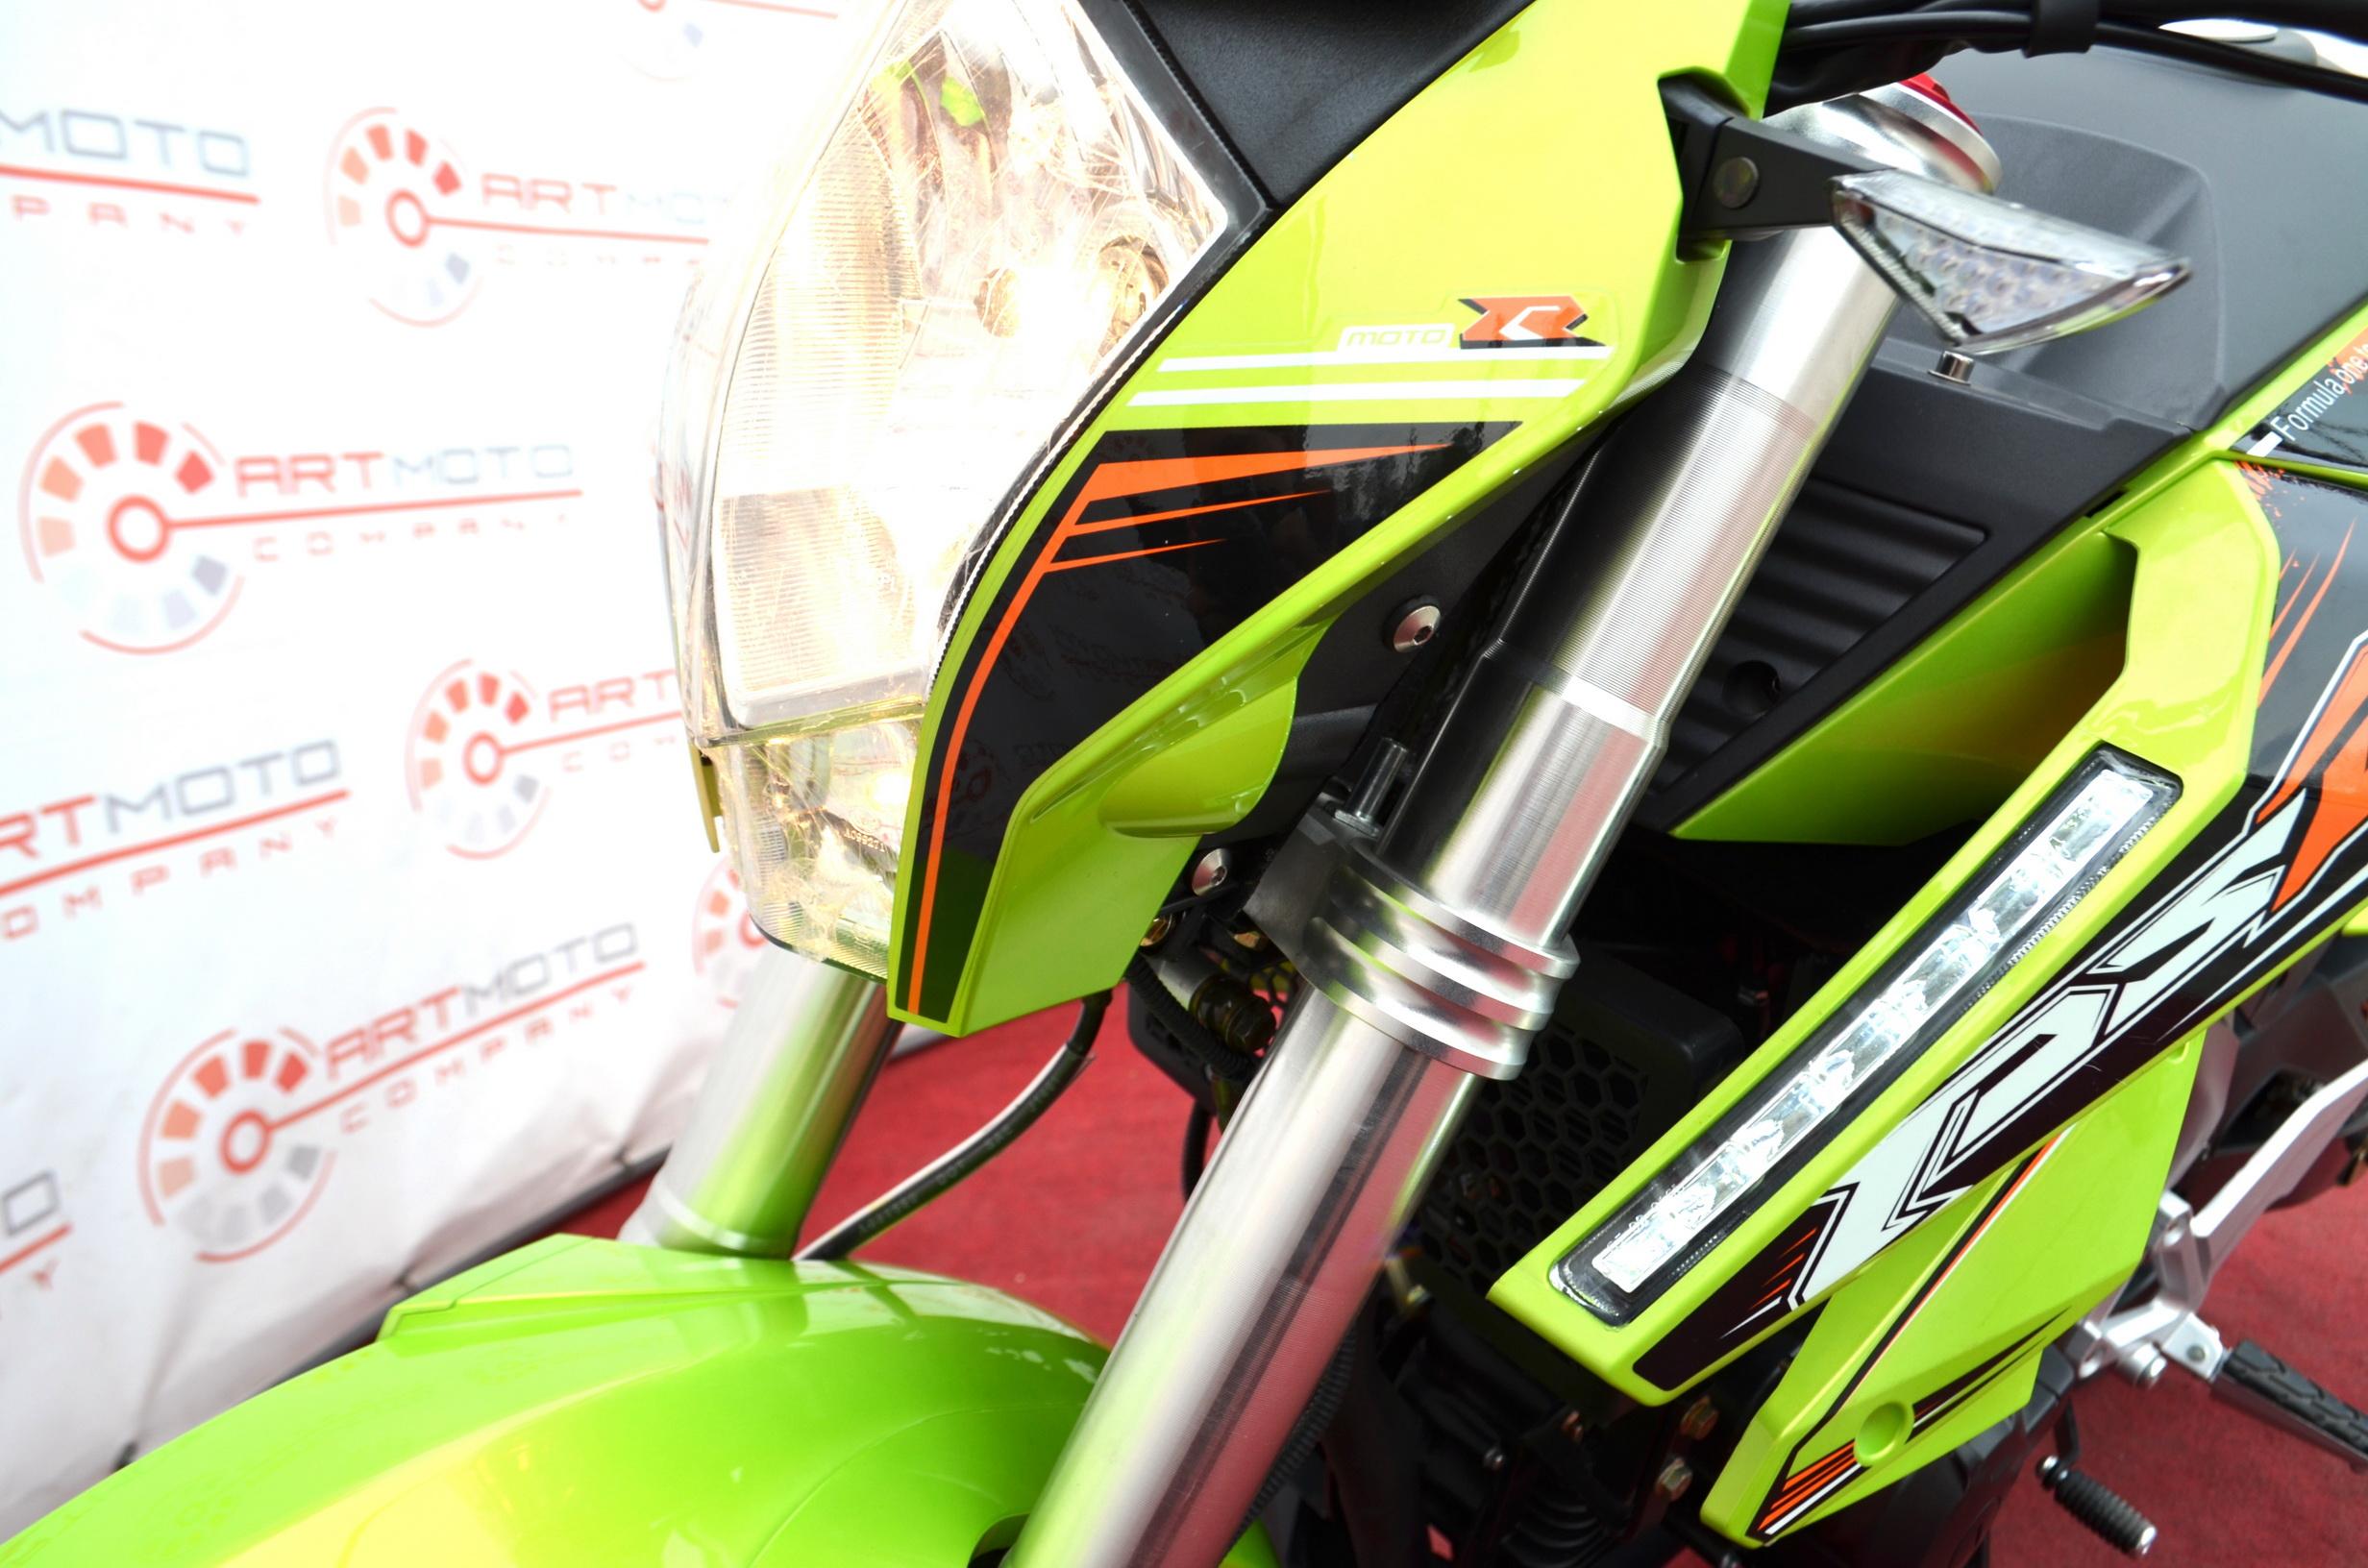 МОТОЦИКЛ BASHAN PSB 250 Green  Артмото - купить квадроцикл в украине и харькове, мотоцикл, снегоход, скутер, мопед, электромобиль